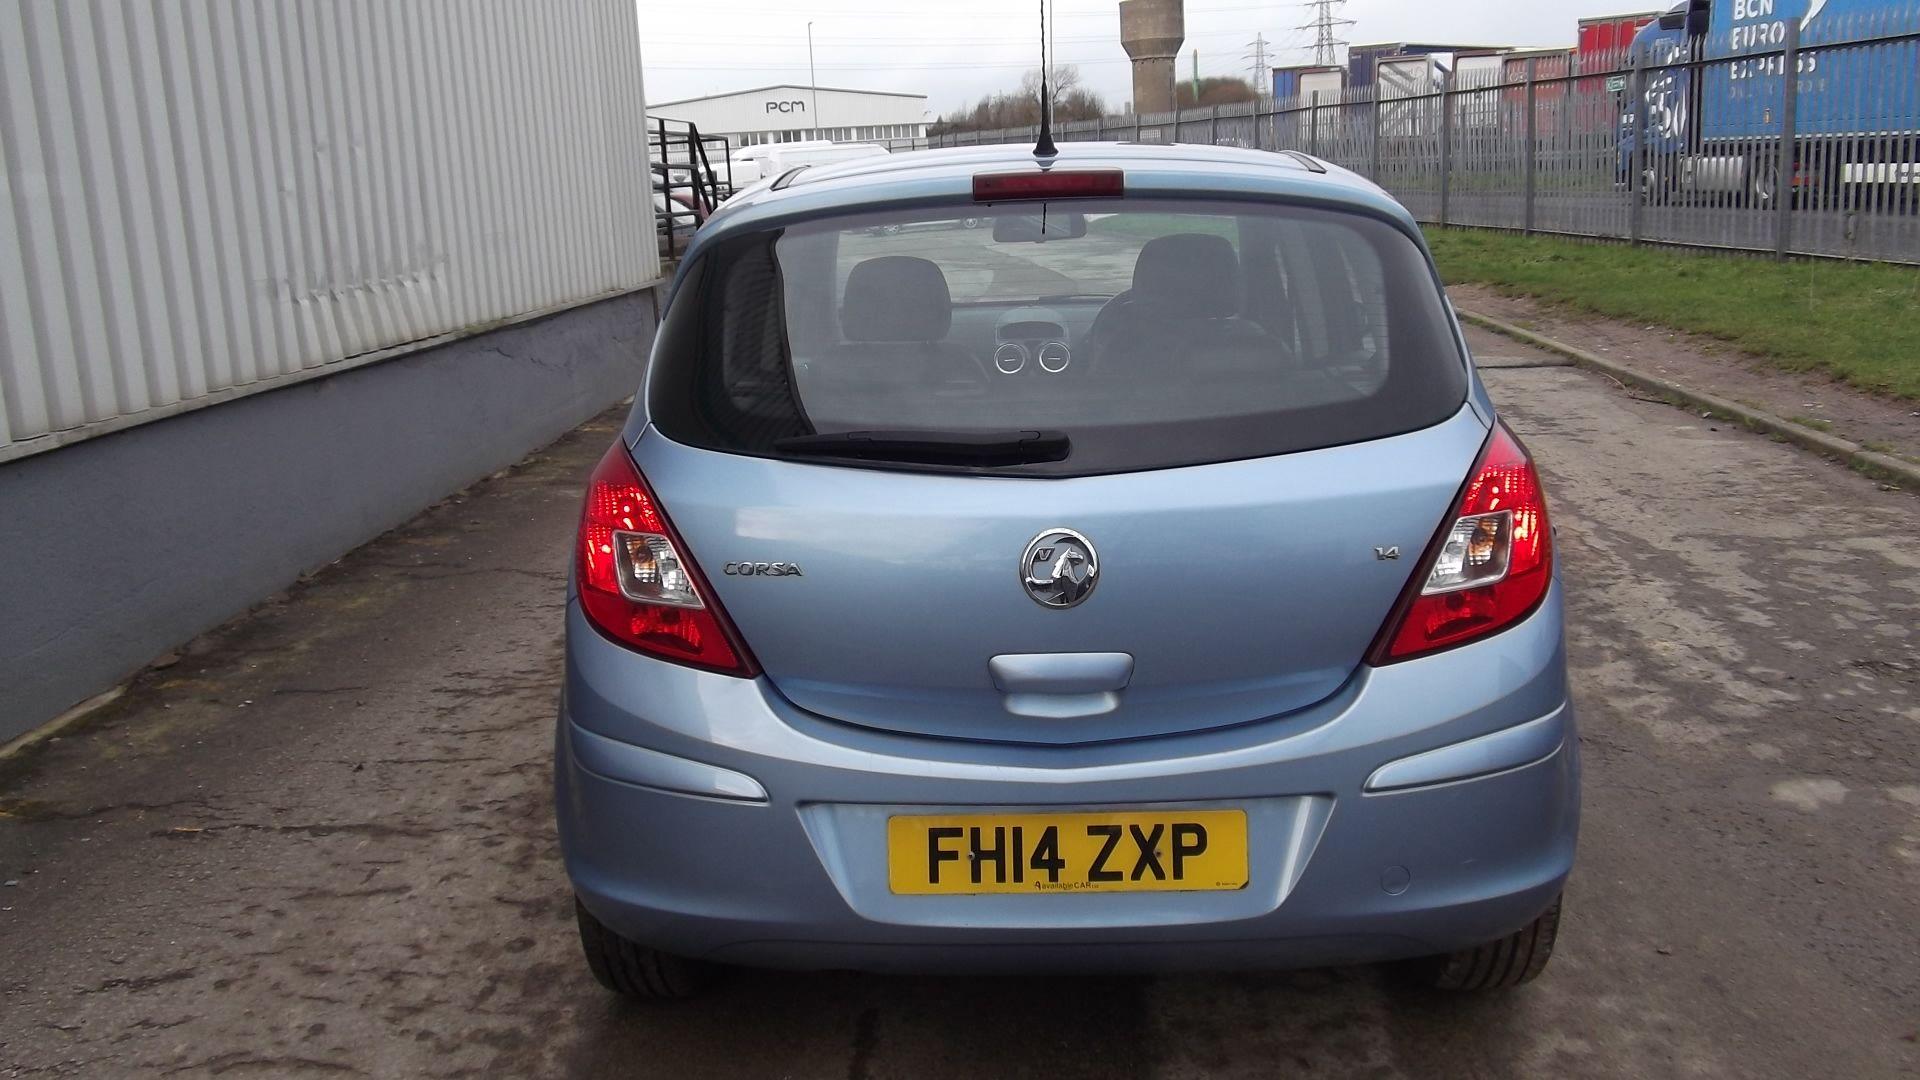 2014 Vauxhall Corsa Se 5Dr Hatchback - Full Service History - CL505 - NO VAT ON THE HAMMER - - Image 19 of 24